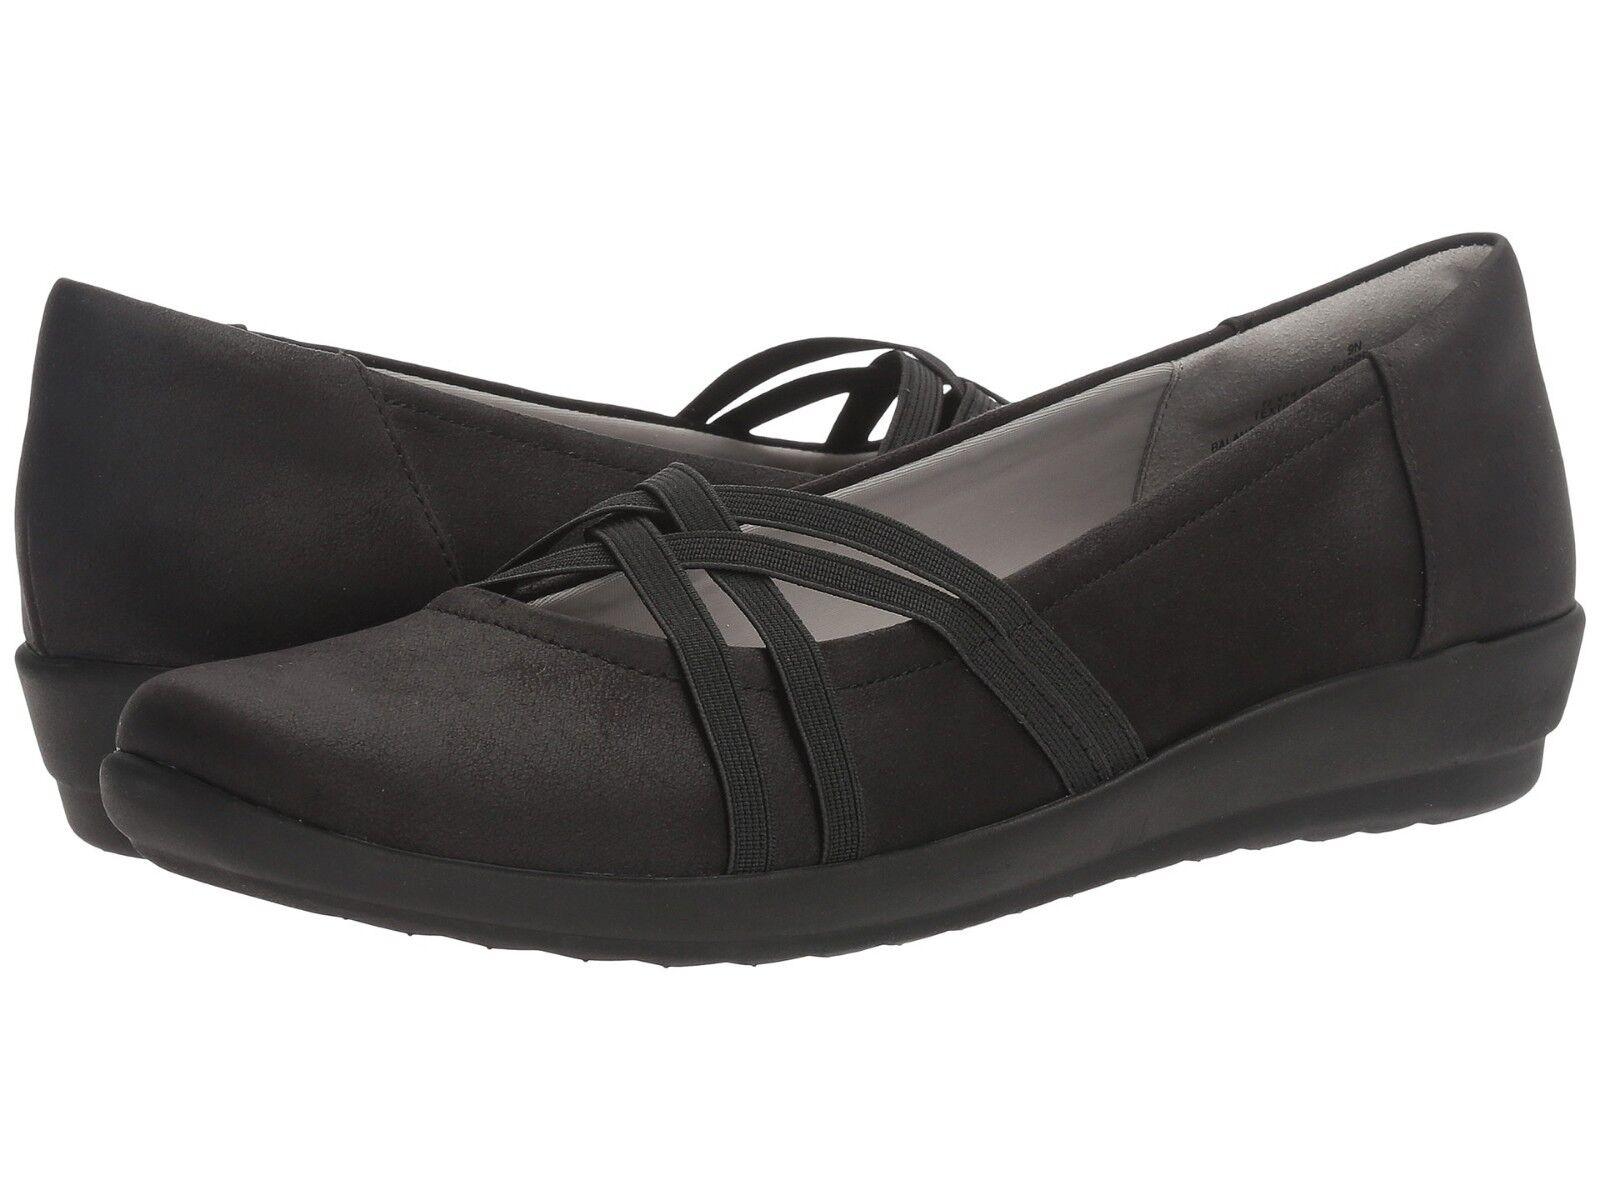 $79 - EASY SPIRIT Women's AUBREE 2 (Black) CASUAL FLATS / SHOES  - 6 M